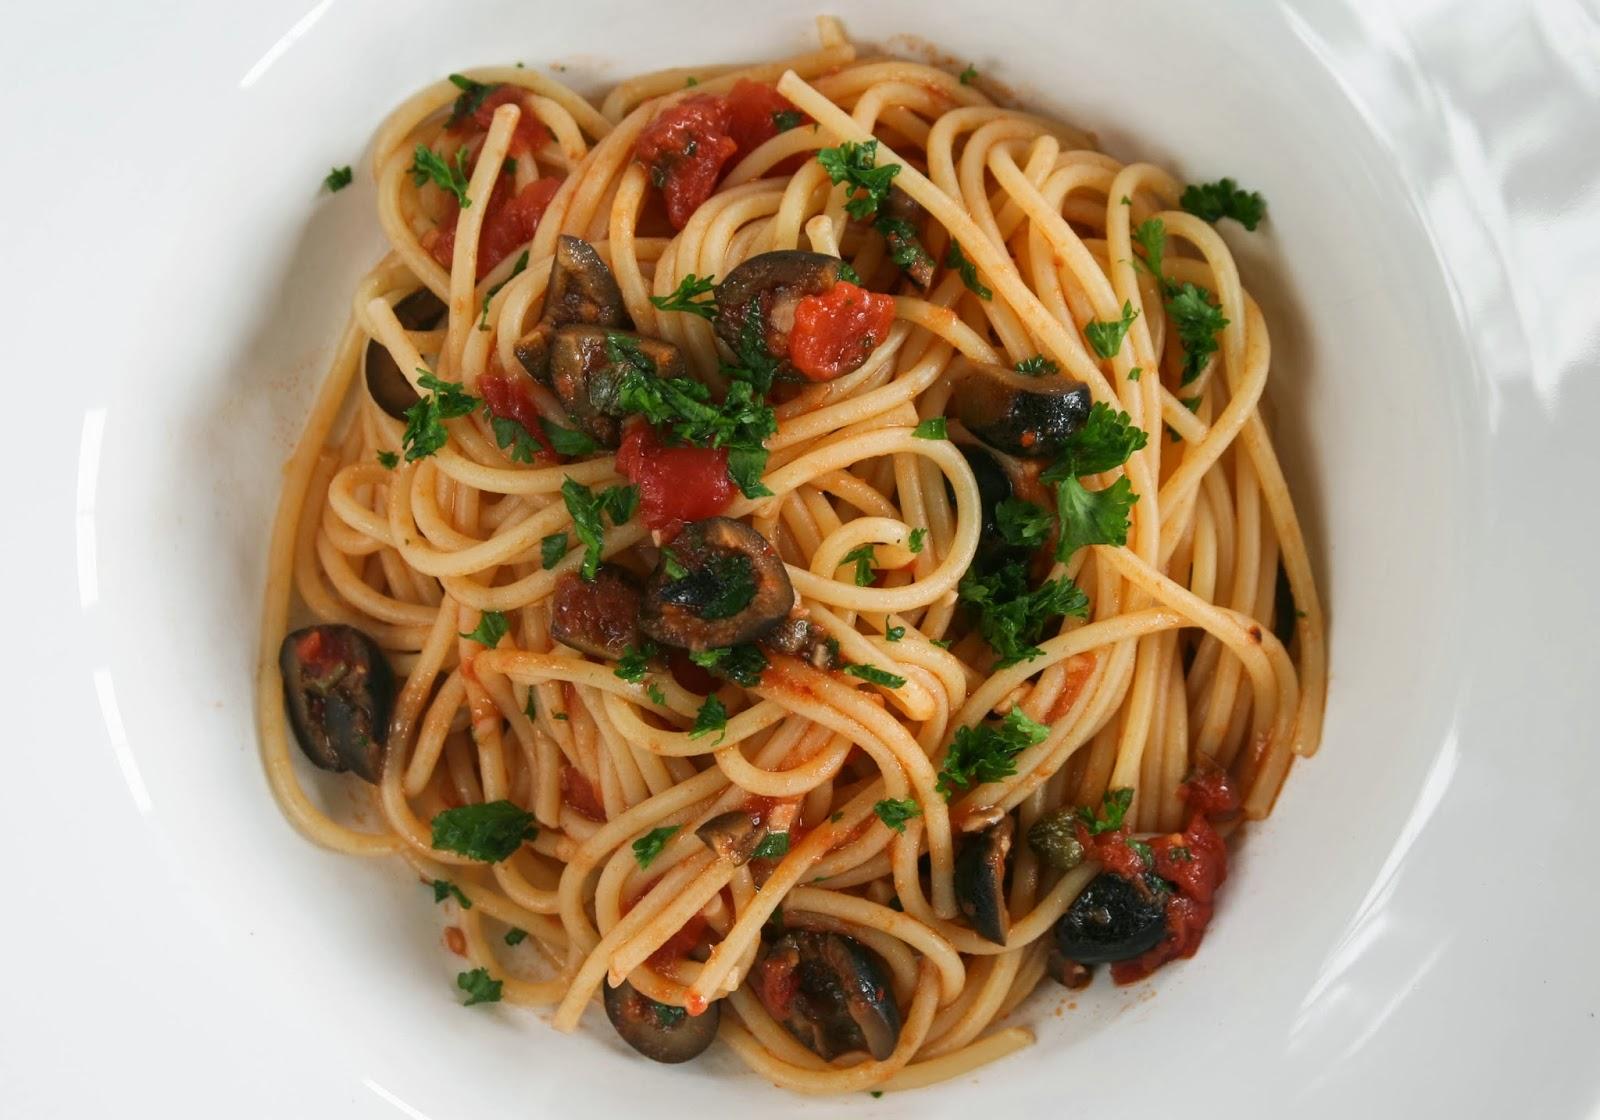 Huis, tuin en keukenvertier: Pasta Puttanesca